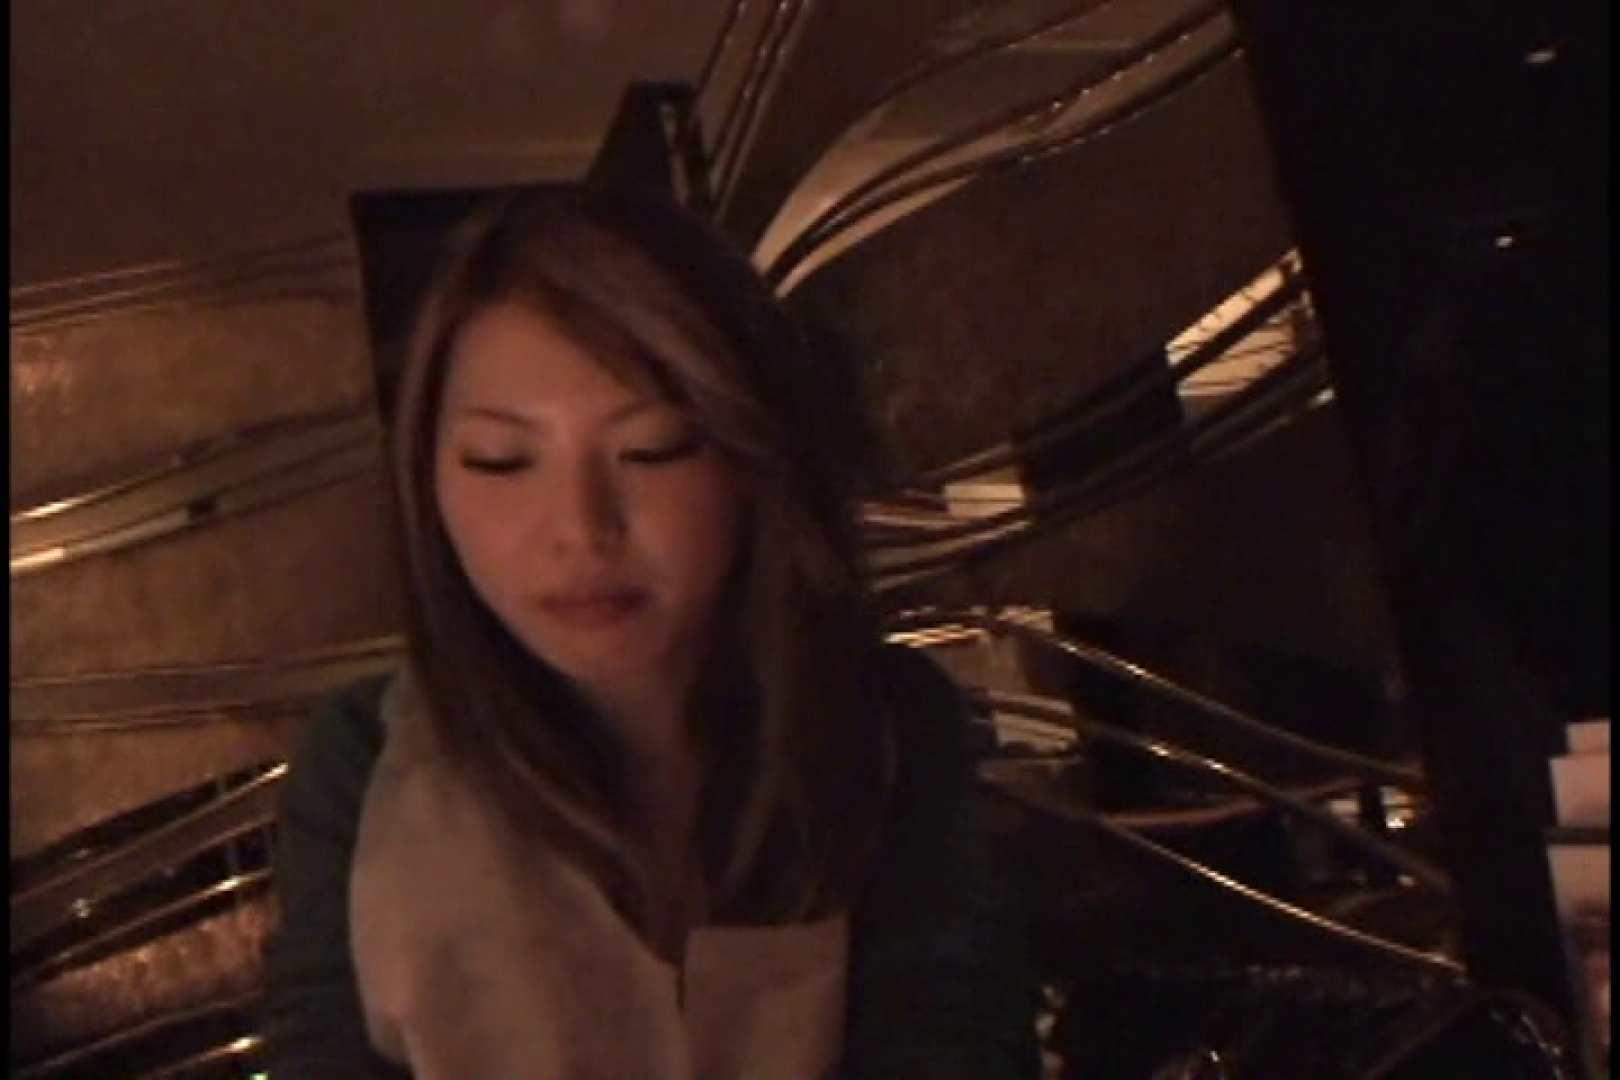 JDハンター全国ツアー vol.012 前編 女子大生のエロ動画  91PIX 42